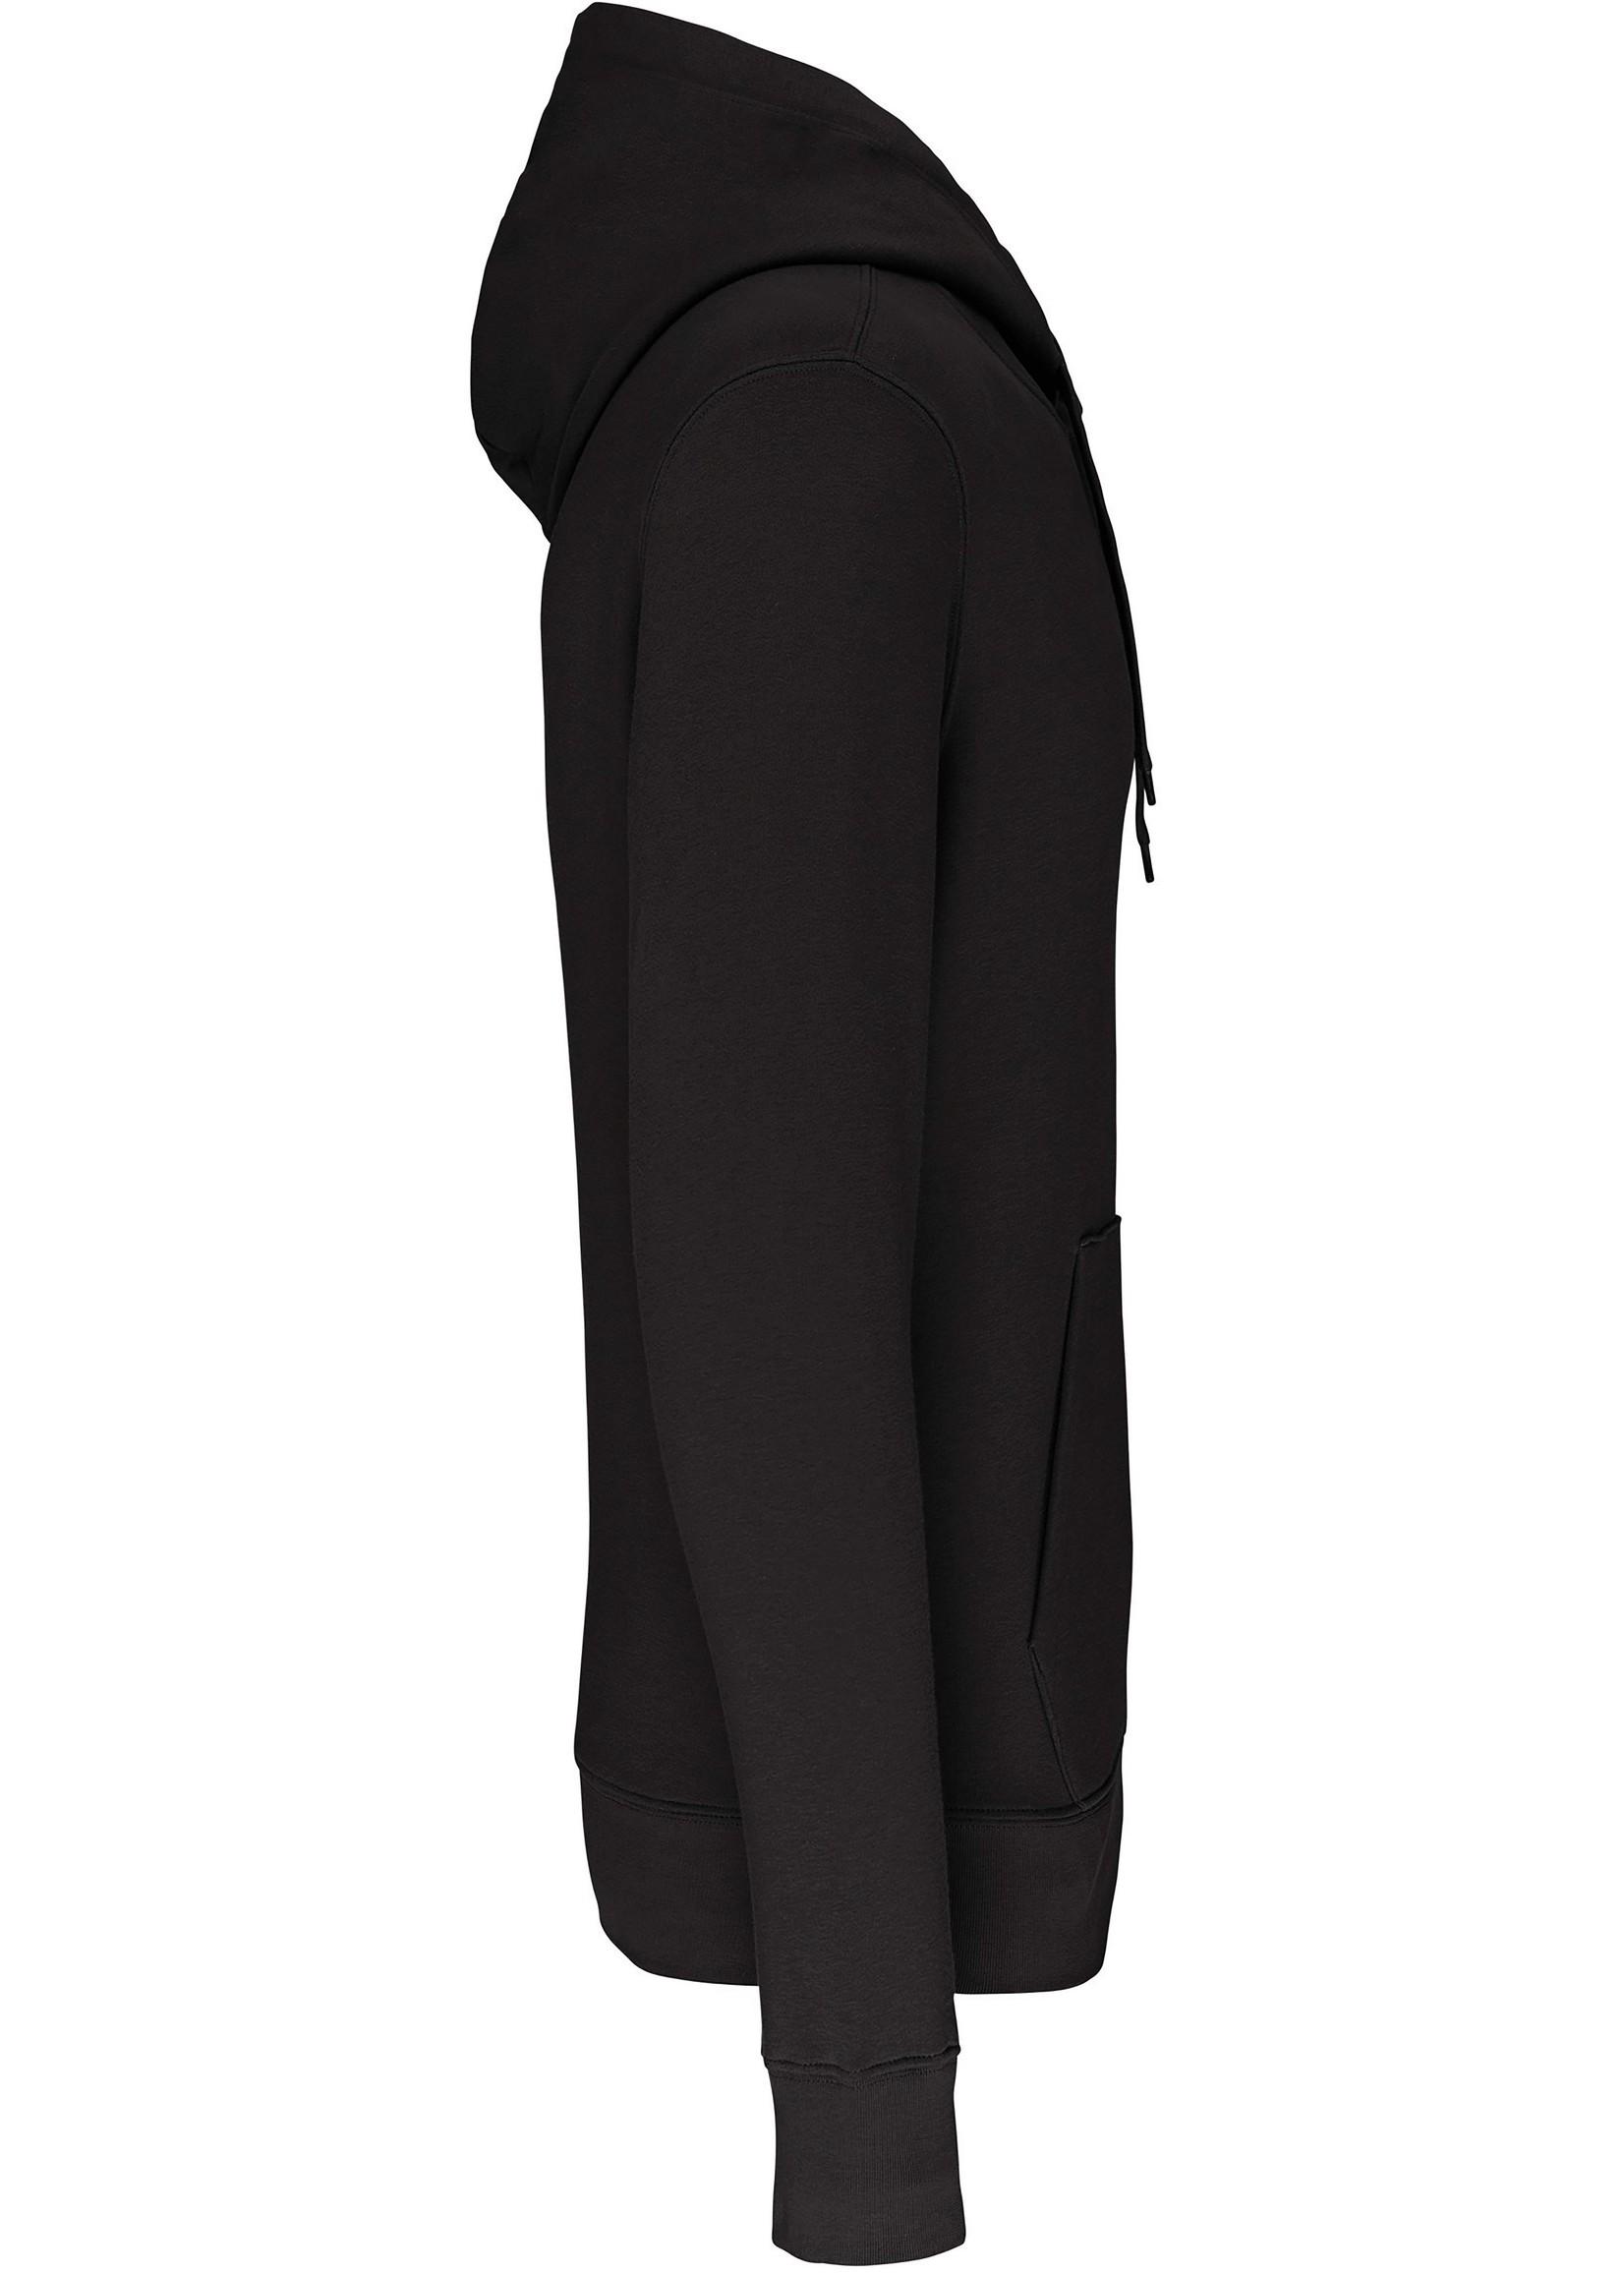 Eco-Friendly Hoodie Uni Black